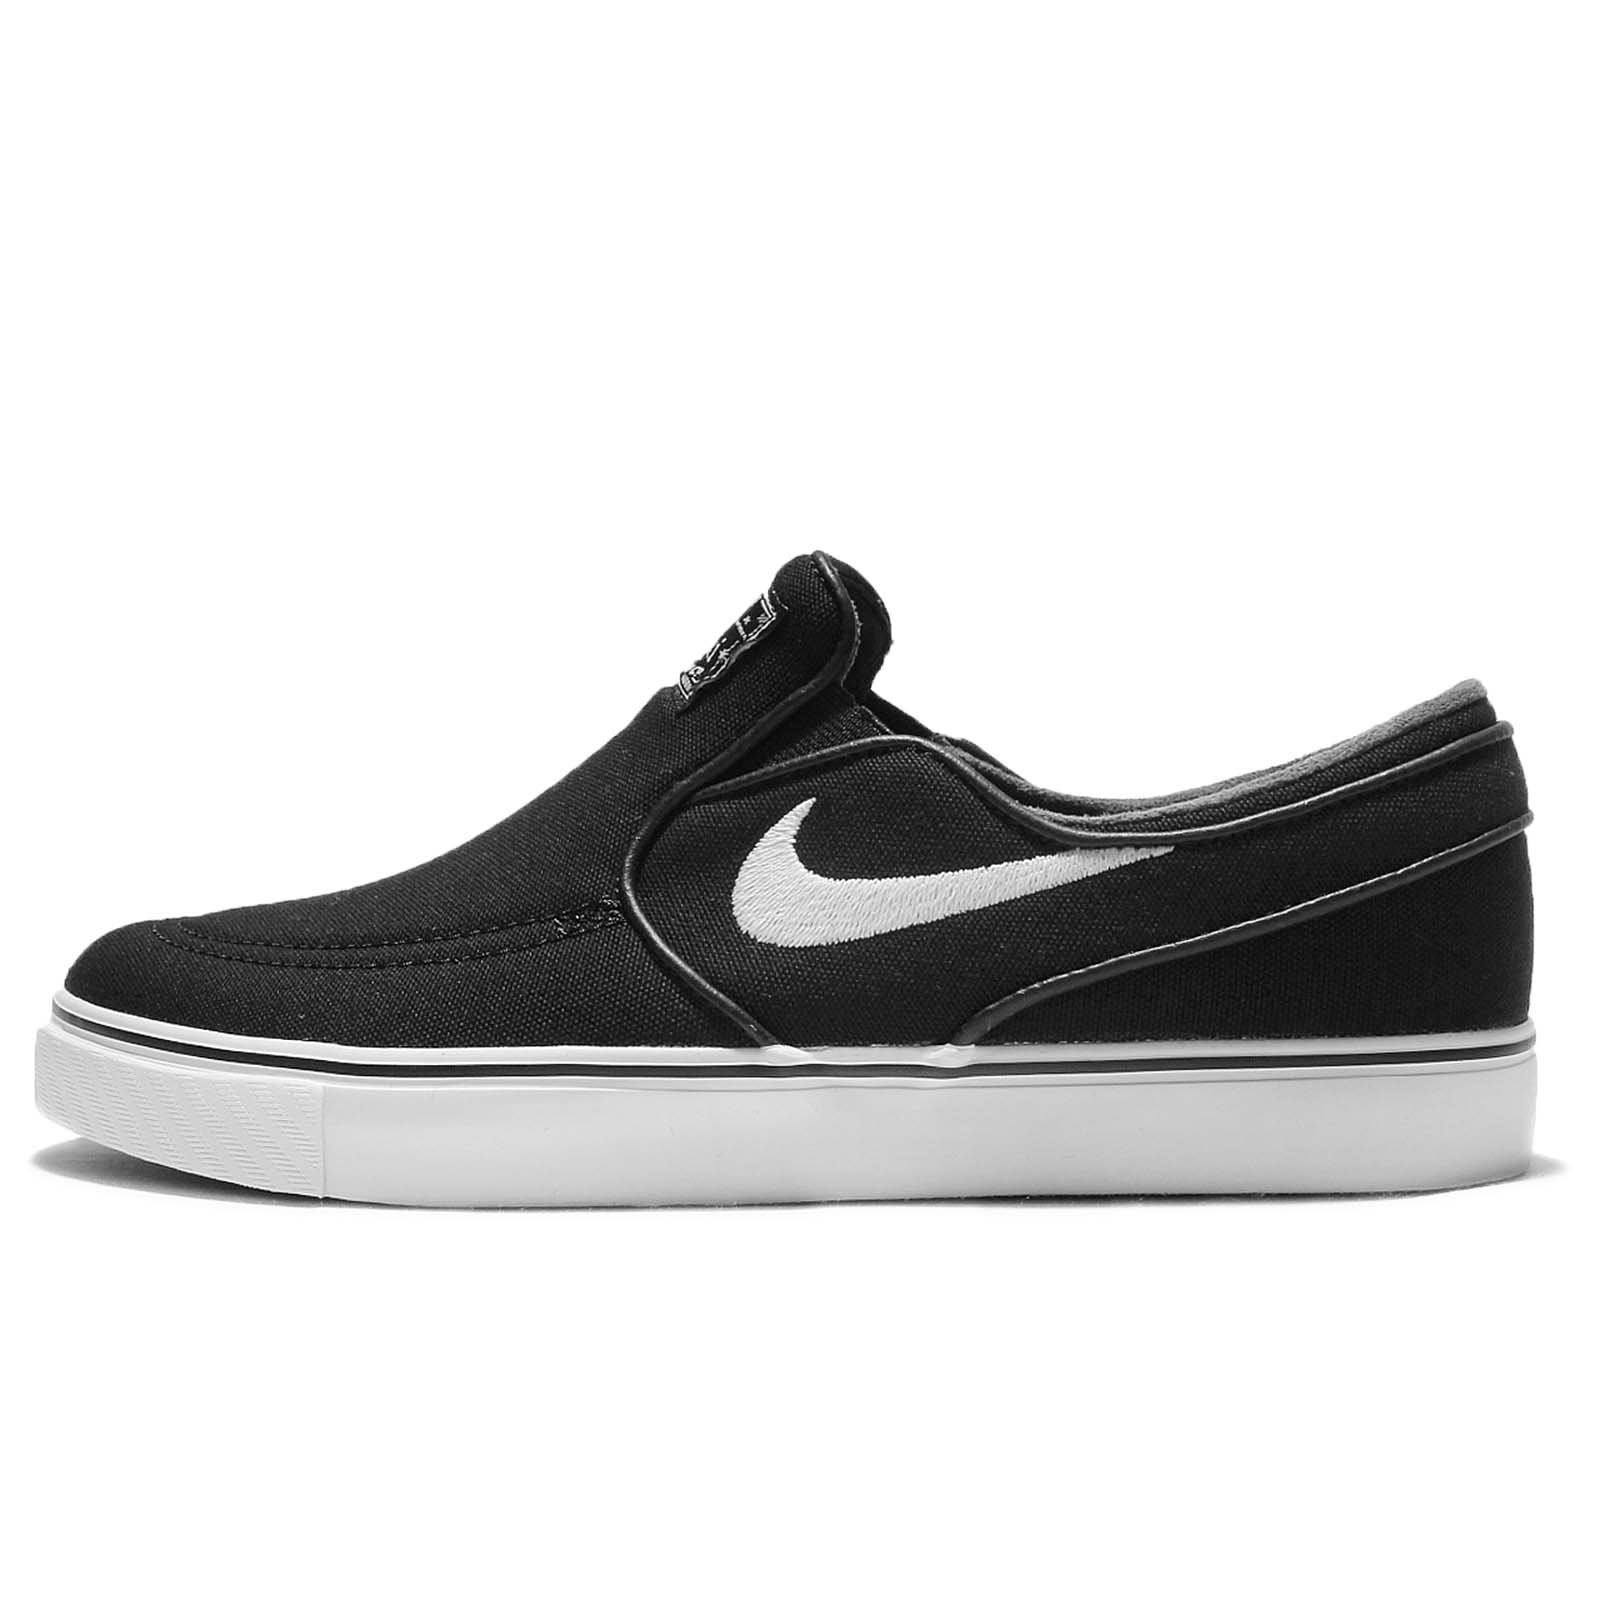 official photos 52275 d8d38 Galleon - Nike Men s Zoom Stefan Janoski Slip CNVS Black White Black Skate  Shoe (4)